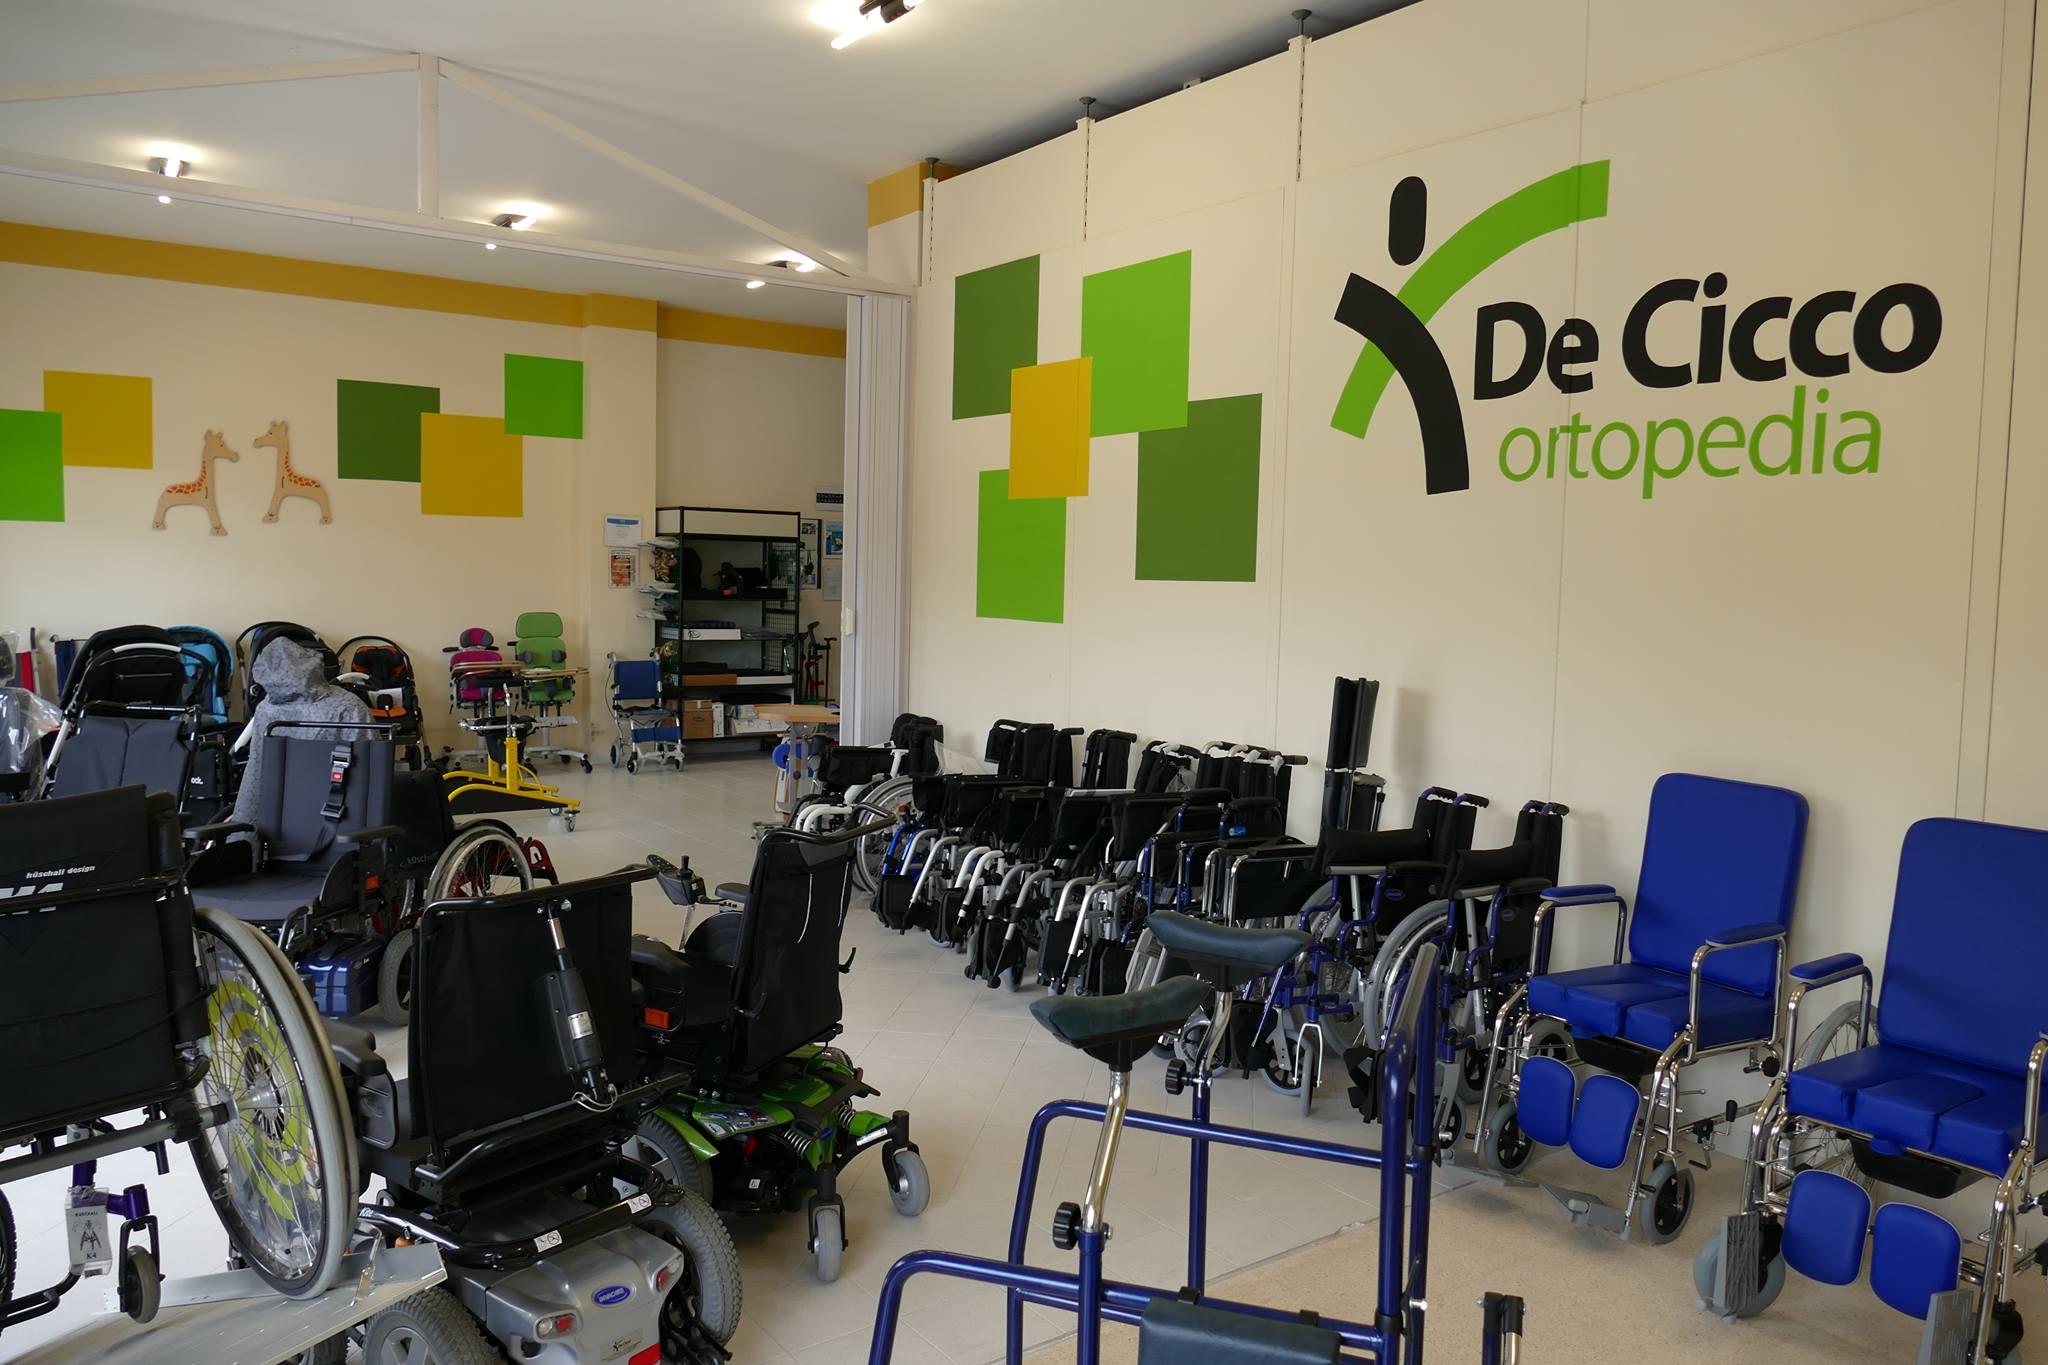 Ortopedia De Cicco